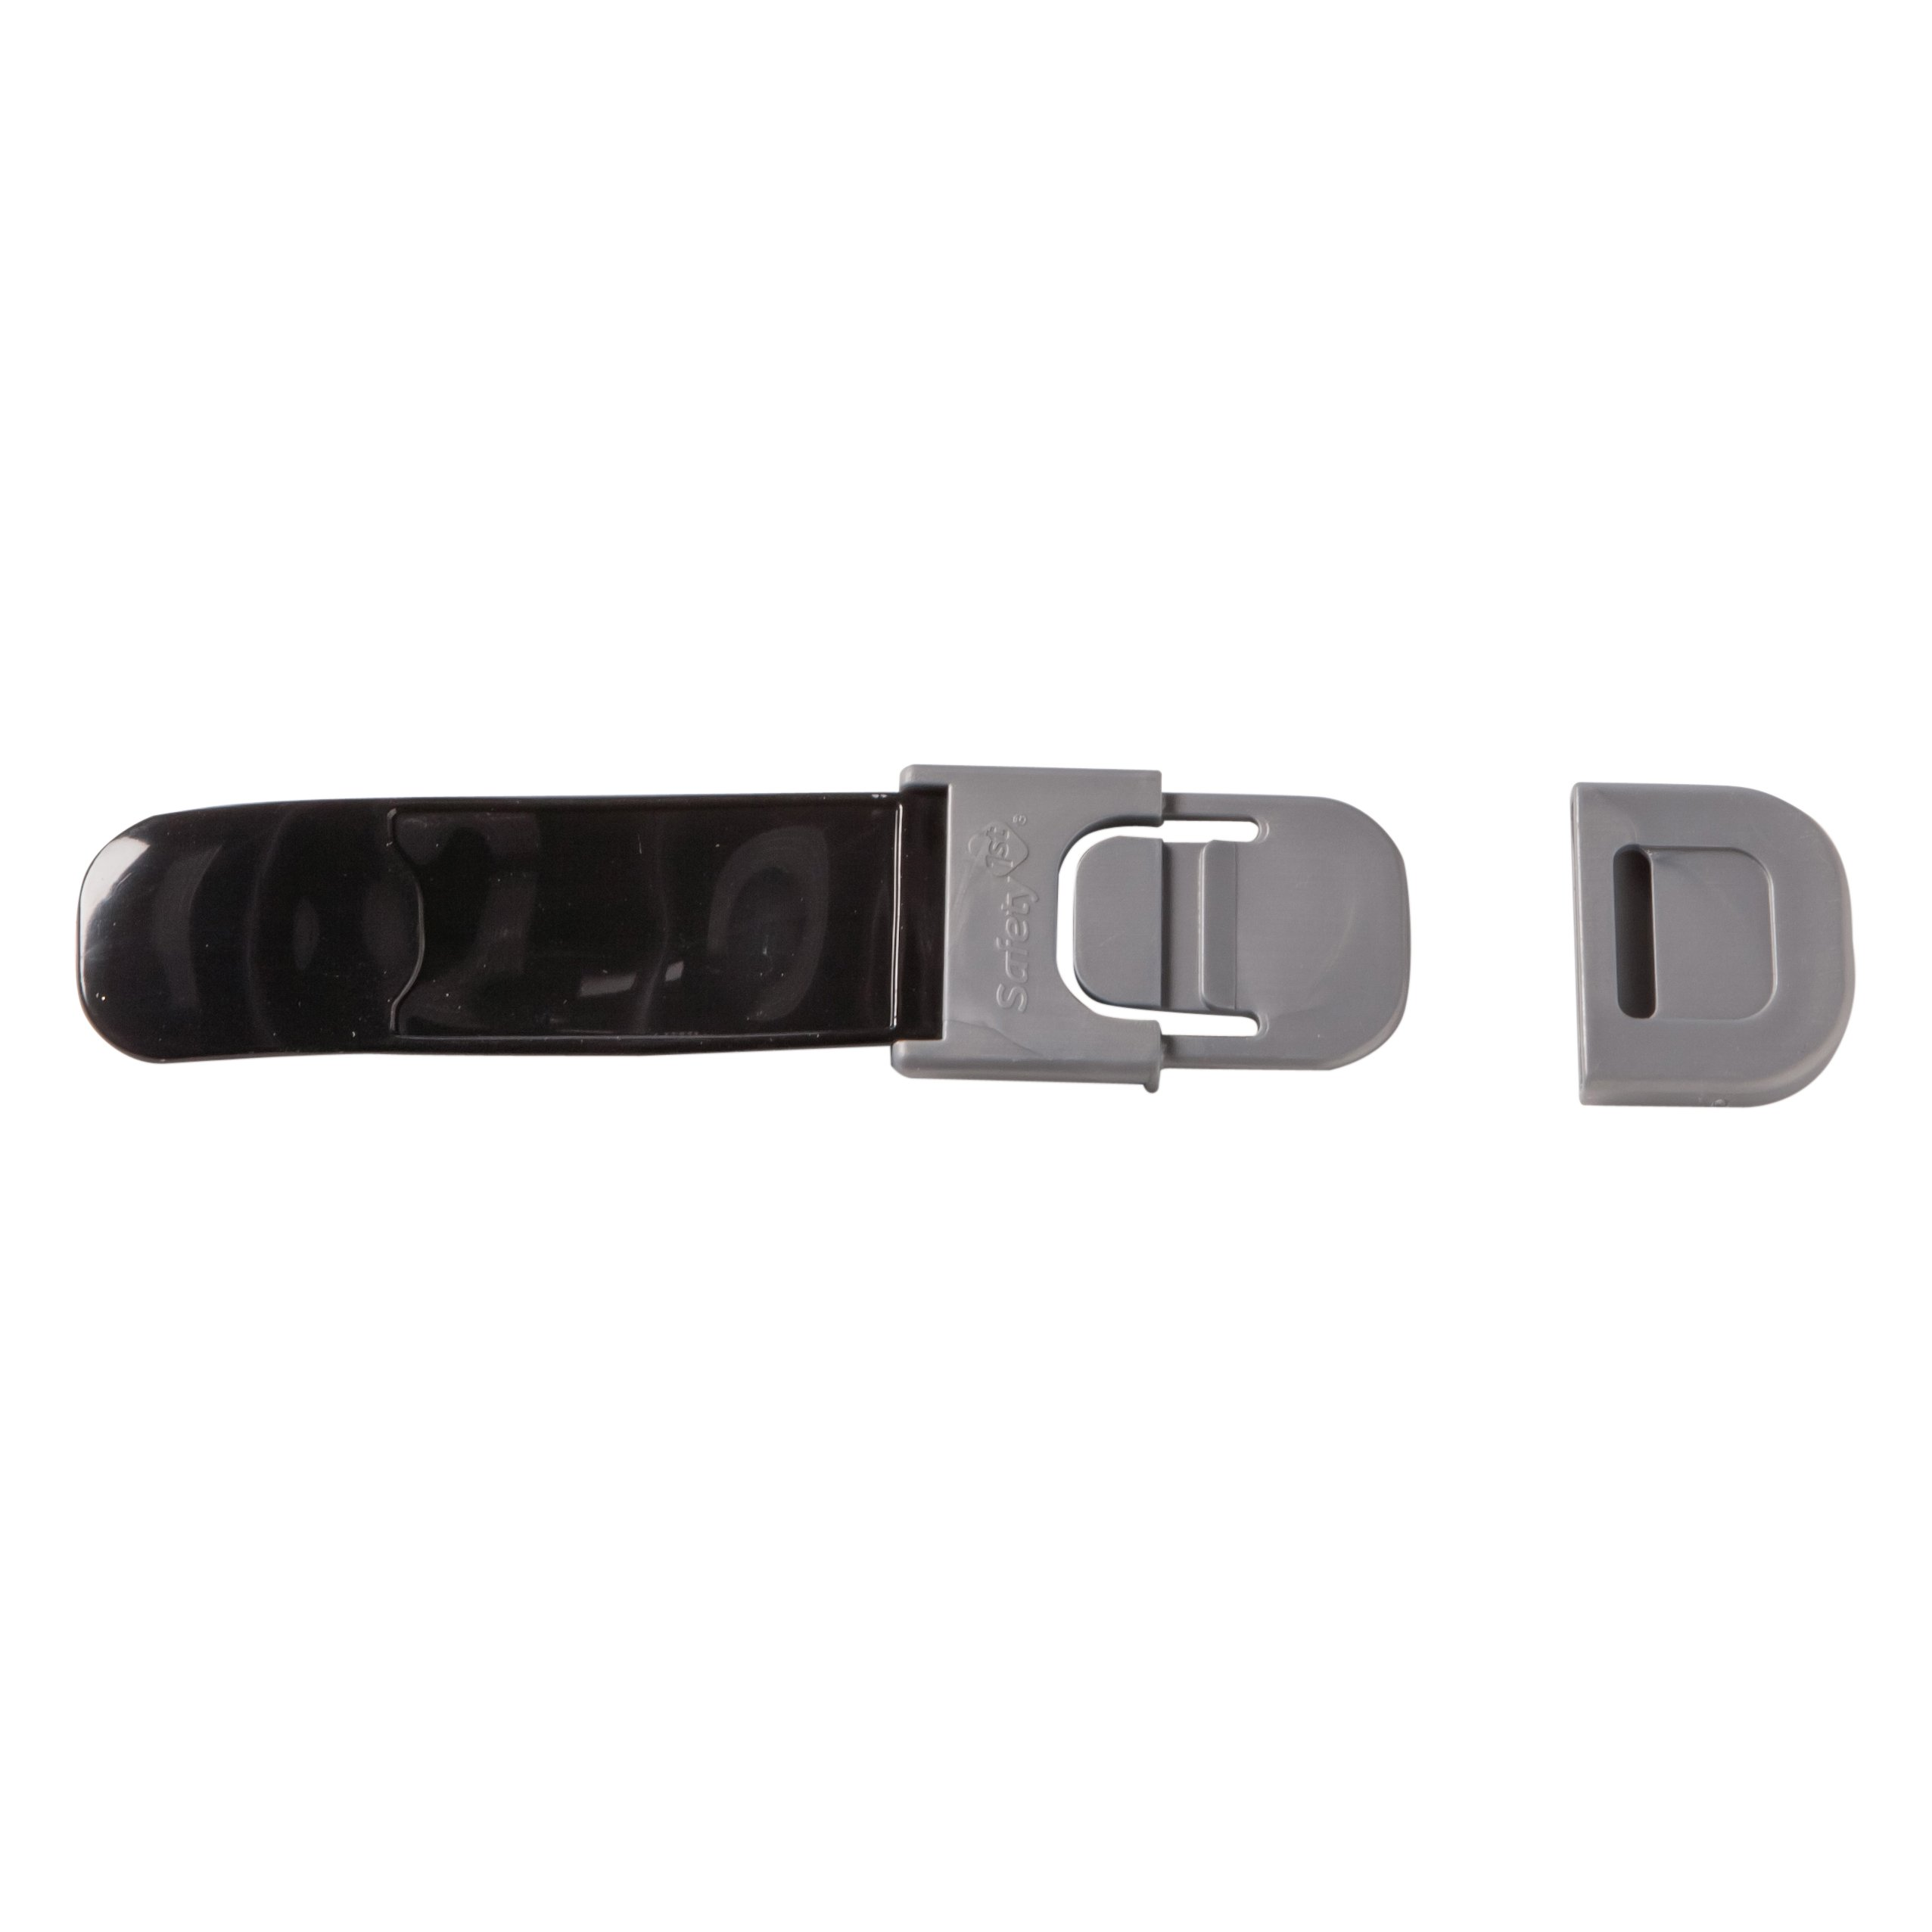 Safety 1st Multi-Purpose Appliance Latch Décor